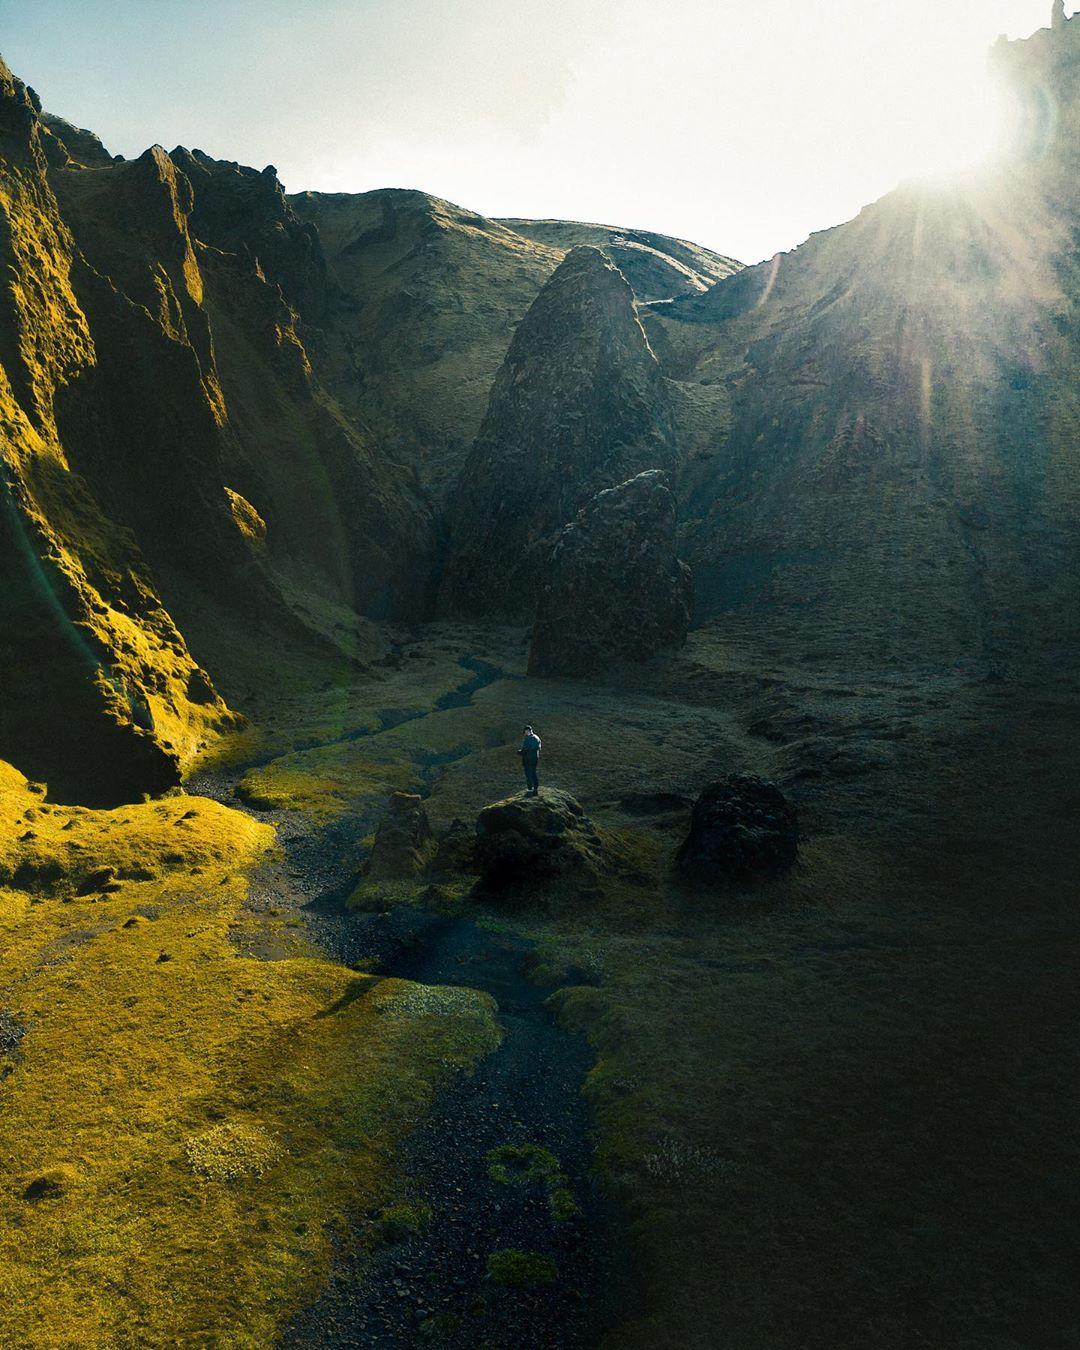 Красота Исландии на снимках Гуннара Фрейра Гуннарссона